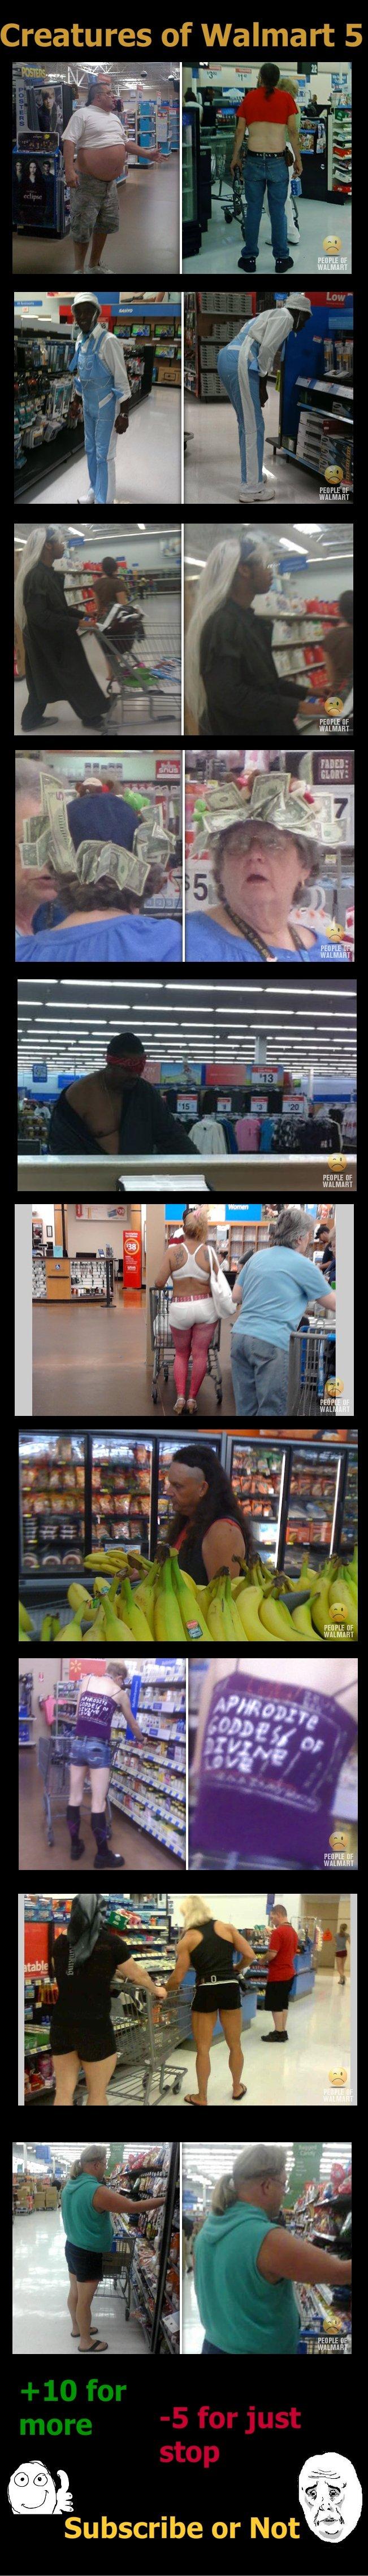 Creatures of Walmart Comp 5. Part 6-www.funnyjunk.com/funny_pictures/2094090/Creatures+of+Walmart+Comp+6/ Part 1- www.funnyjunk.com/funny_pictures/2083969/Creat